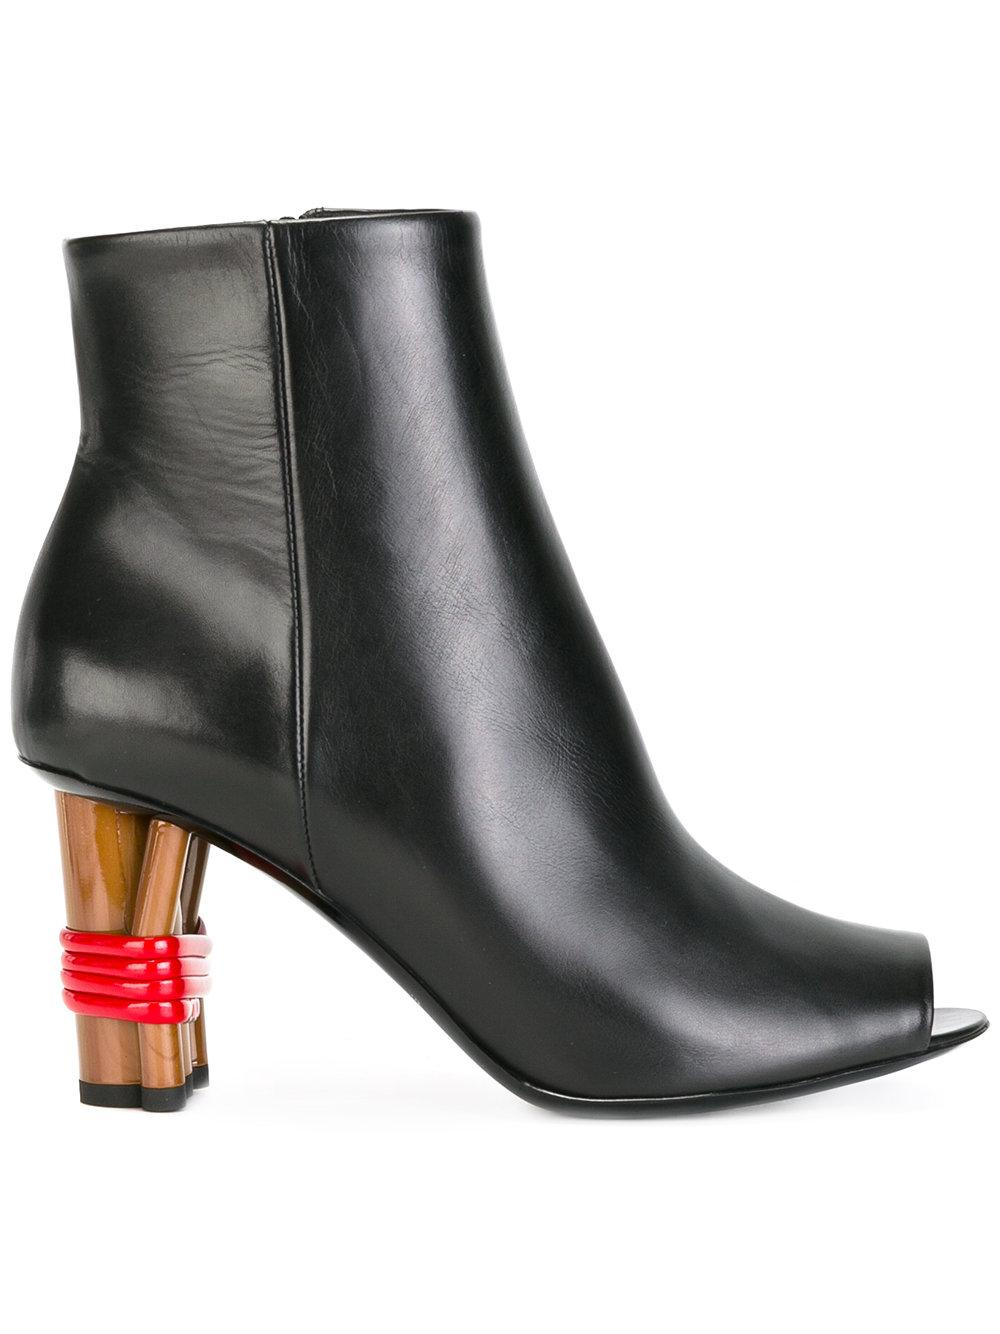 balenciaga open toe boots leather 38 5 in